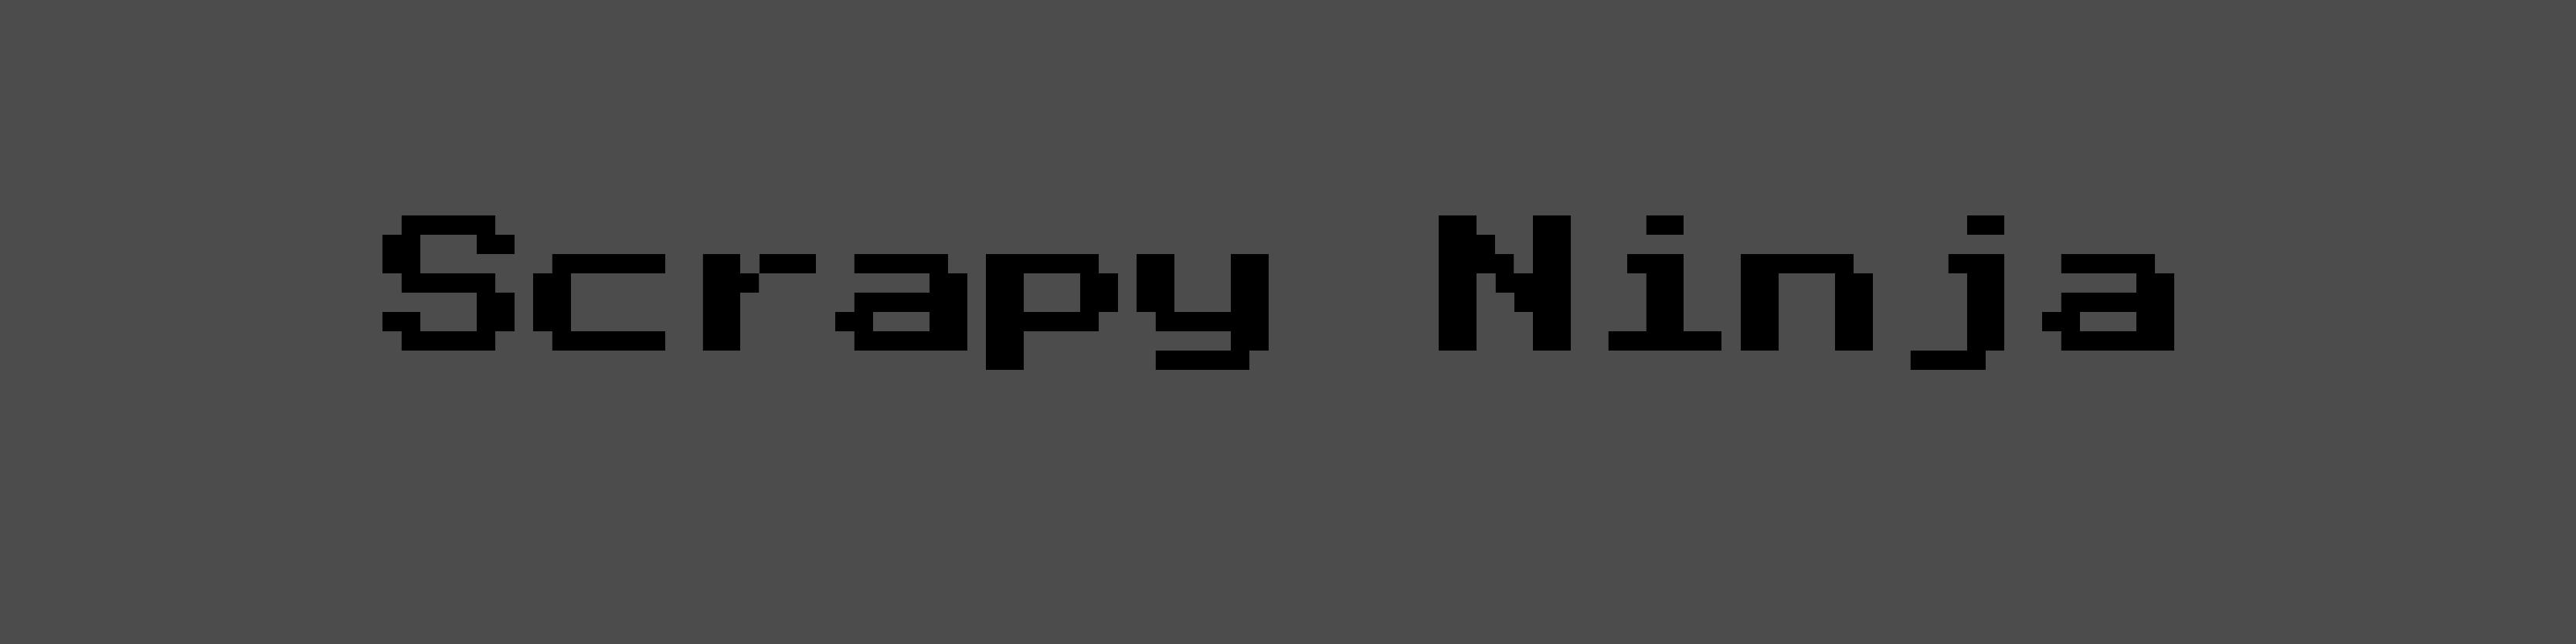 Scrapy Ninja